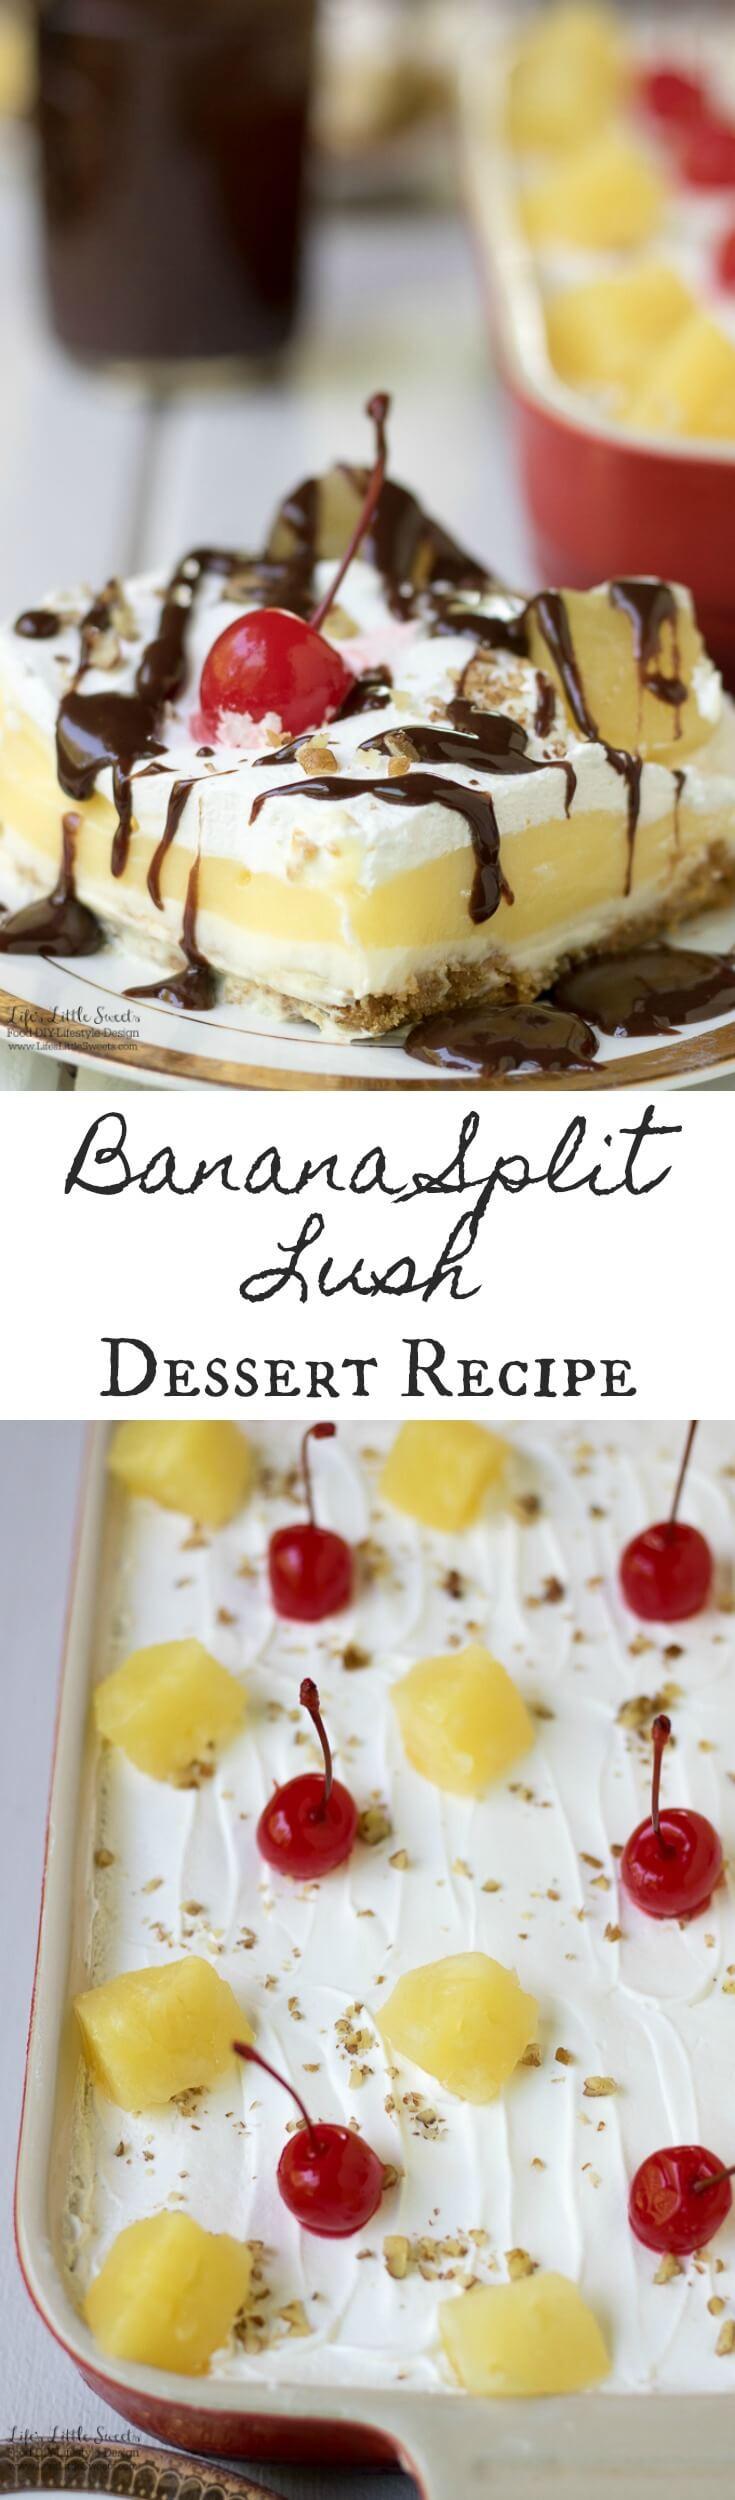 Winning Potluck Dessert Recipes  Banana Split Lush Dessert Recipe 12 Slices Banana Cream